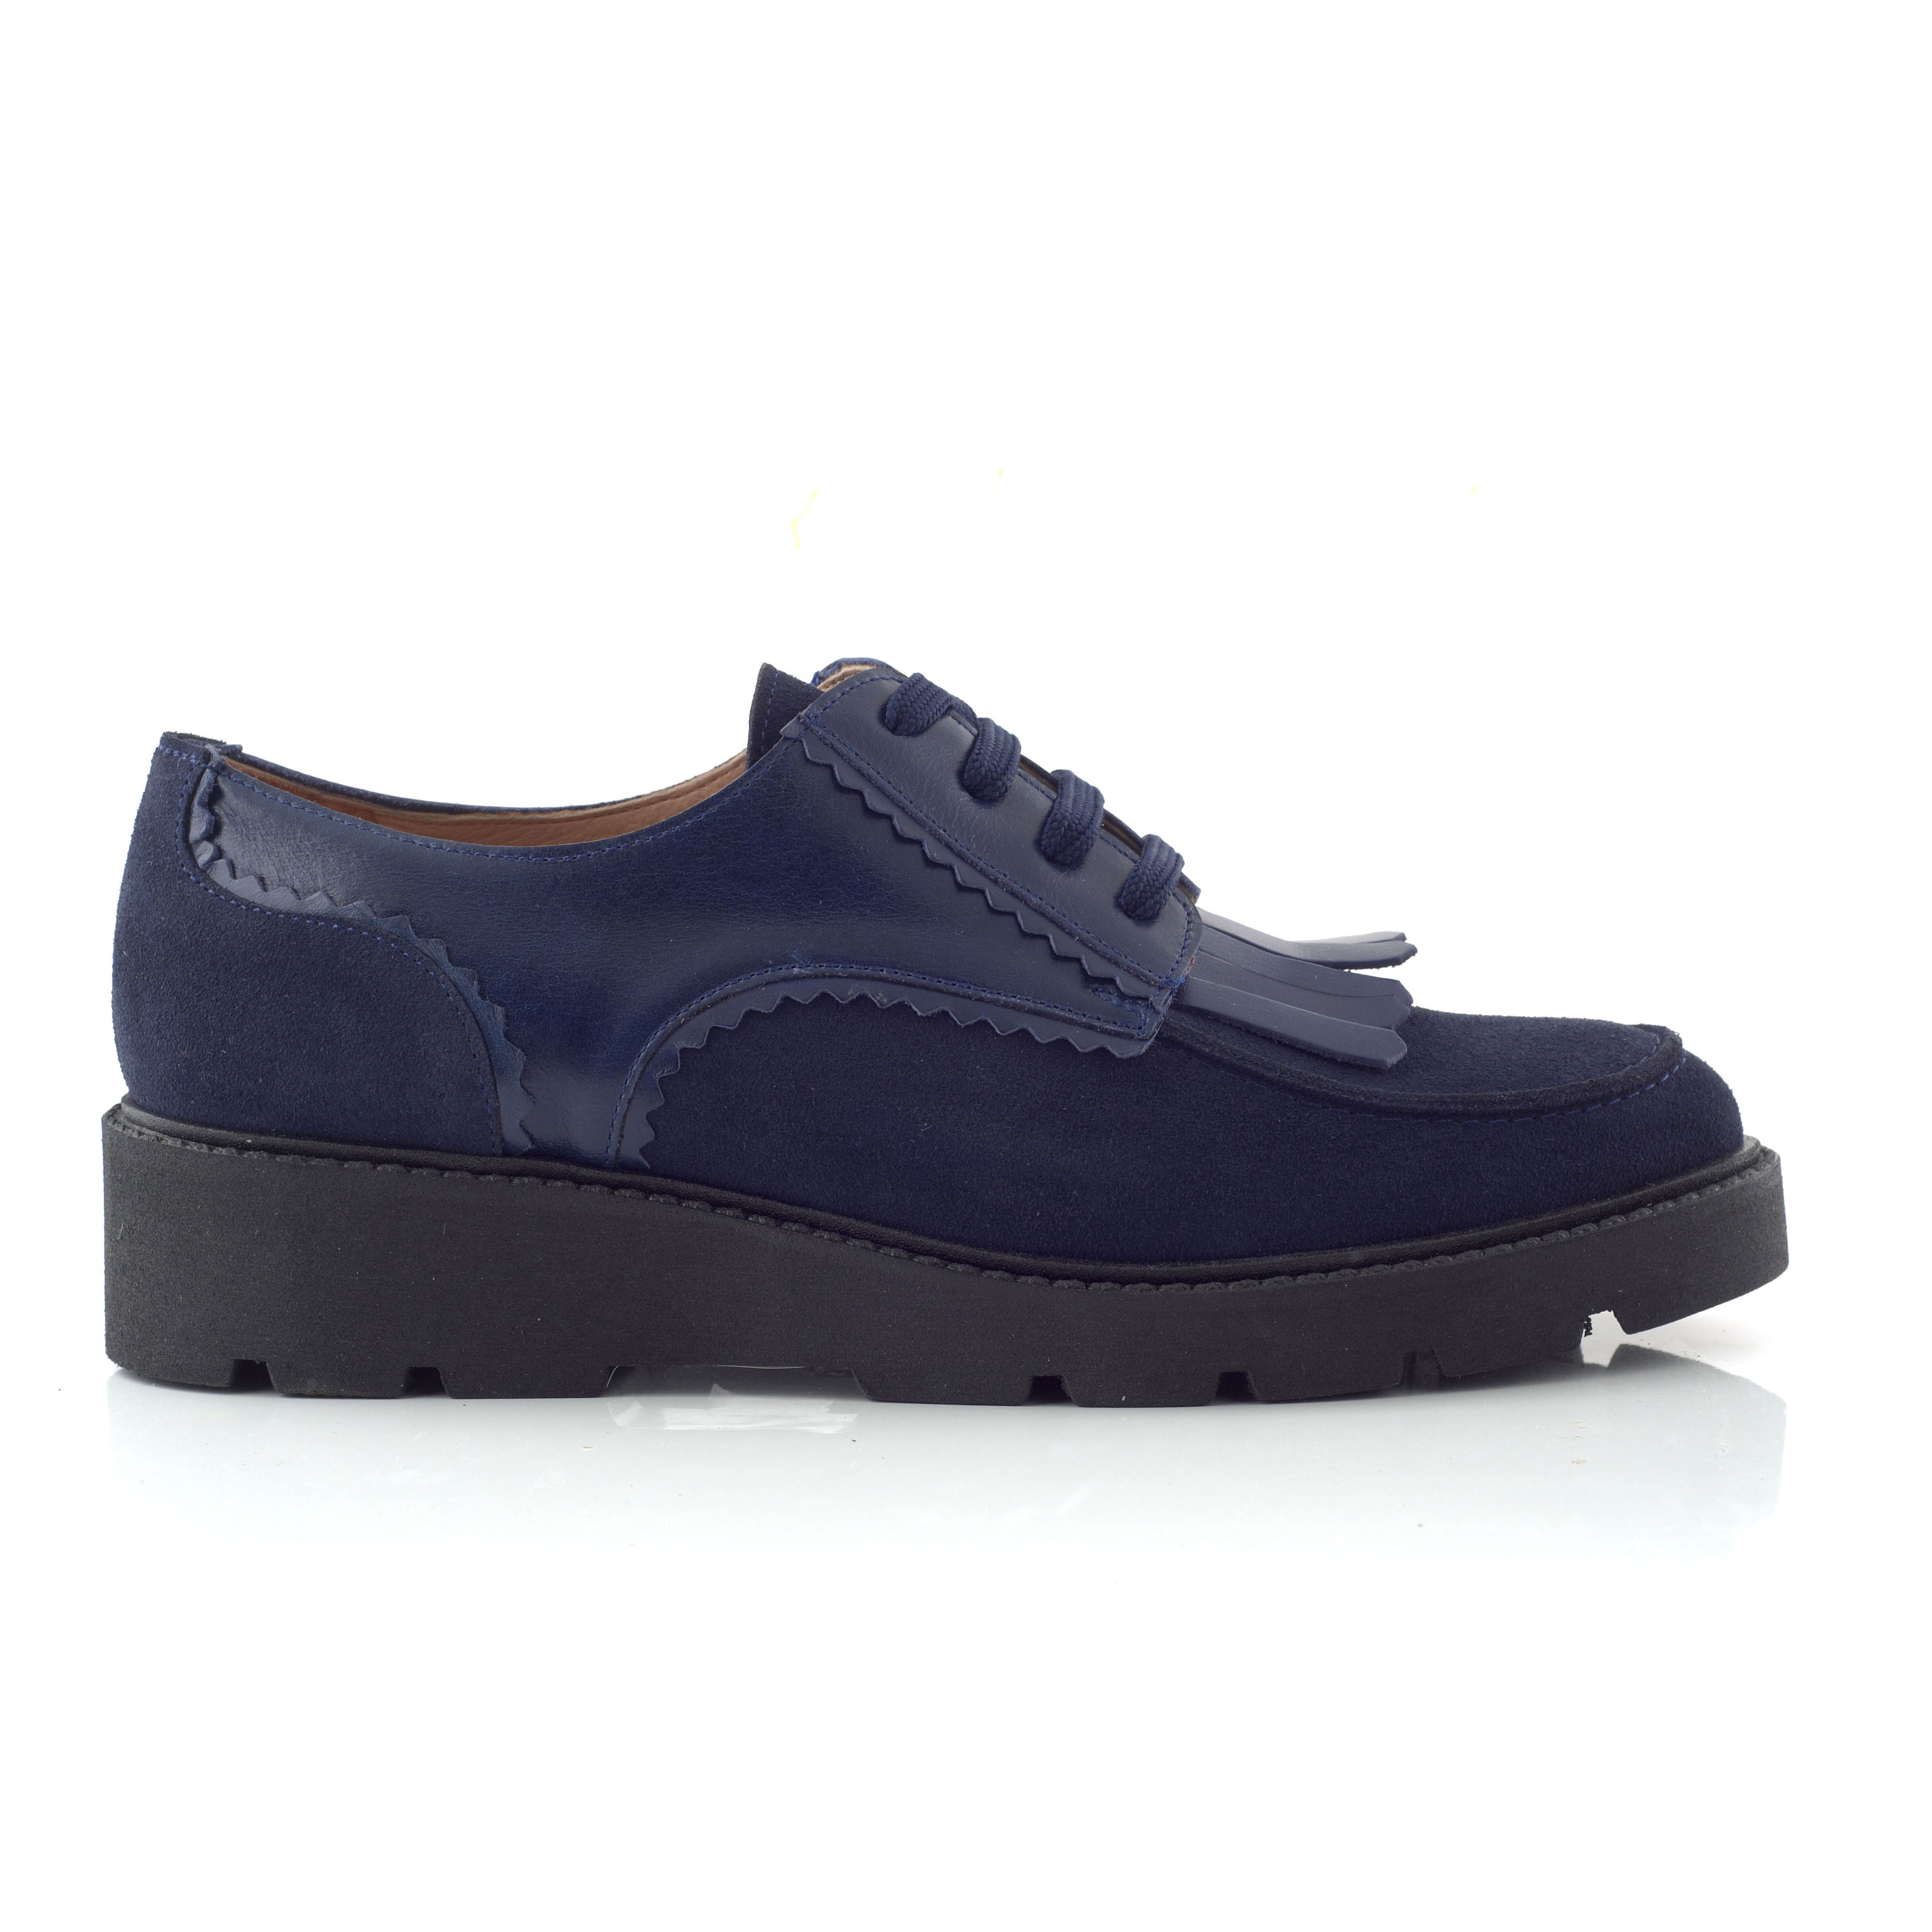 CHANIOTAKIS – Γυναικεία παπούτσια OXFORD SOFTY μπλε